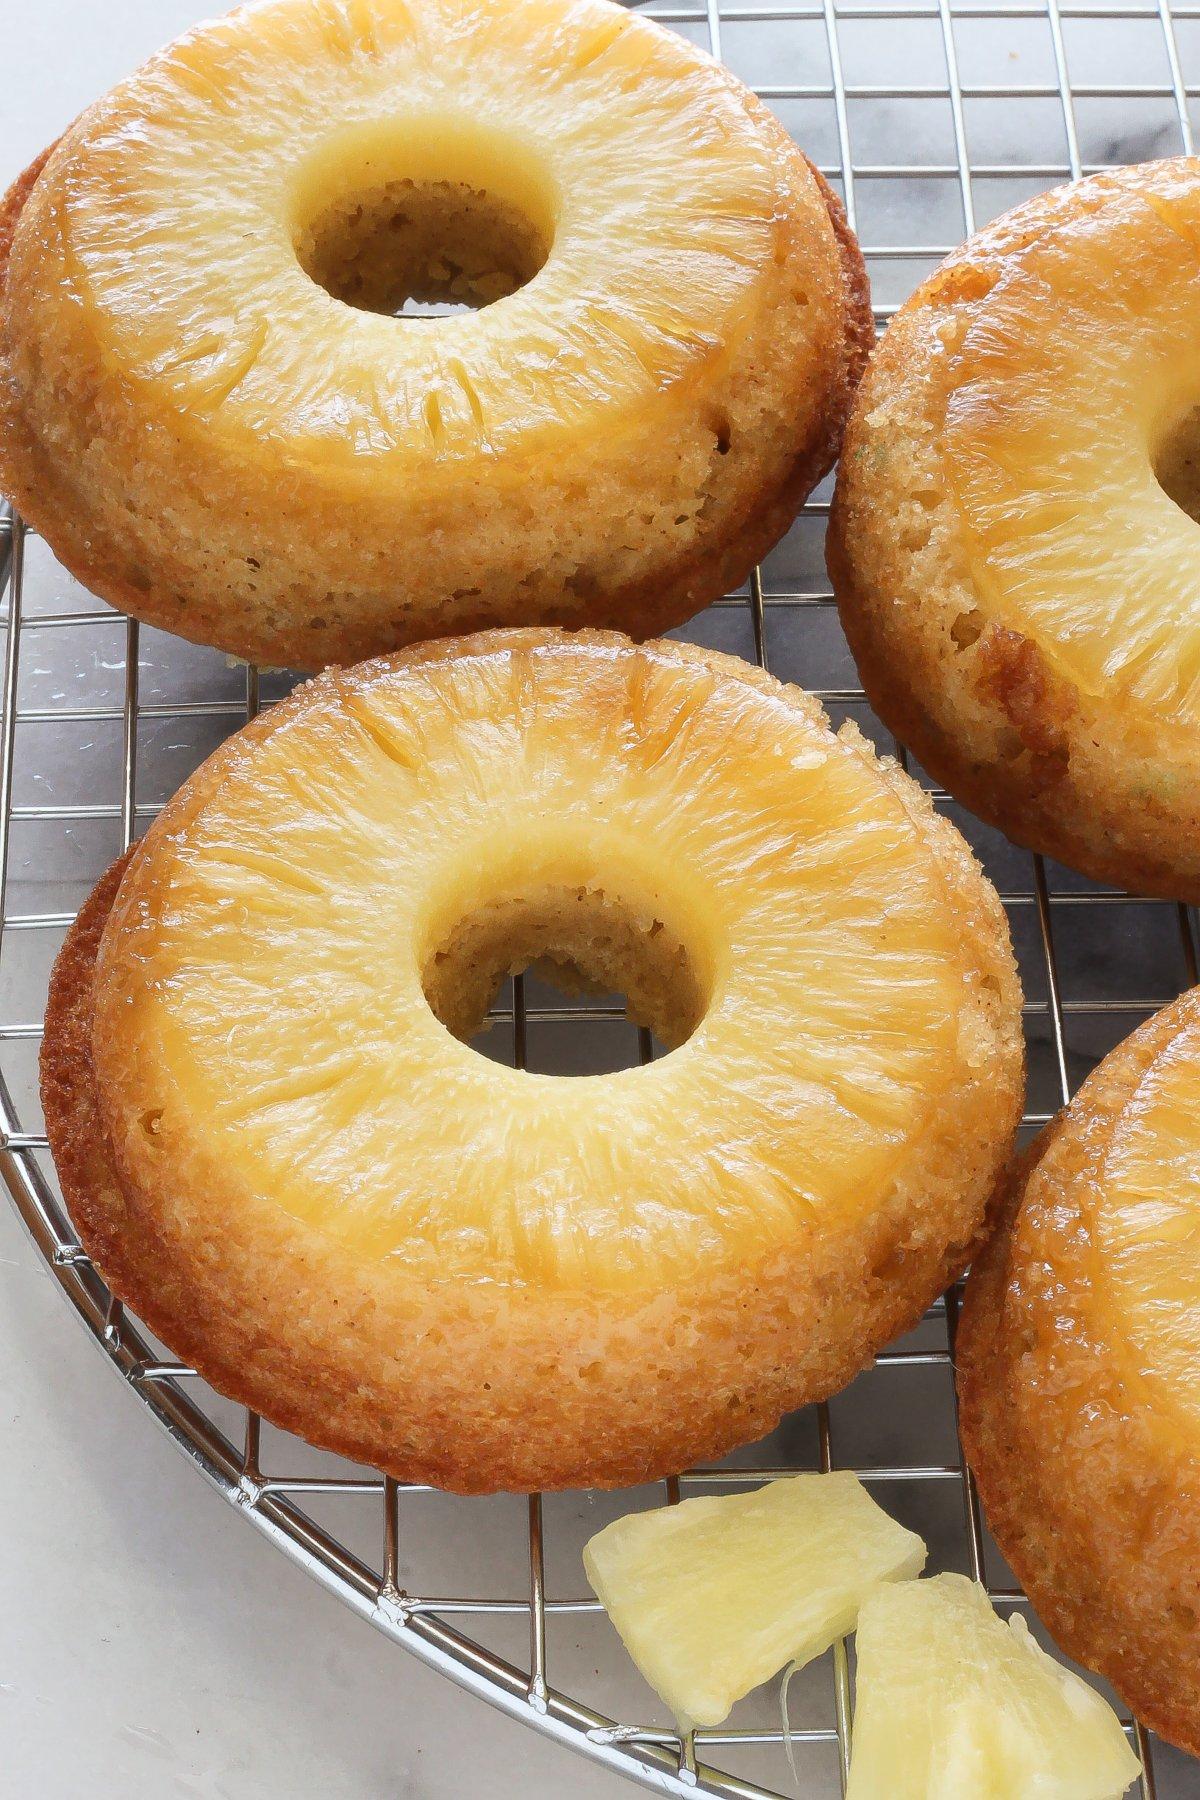 upside down cake pineapple upside down cake plum upside down cake i ...